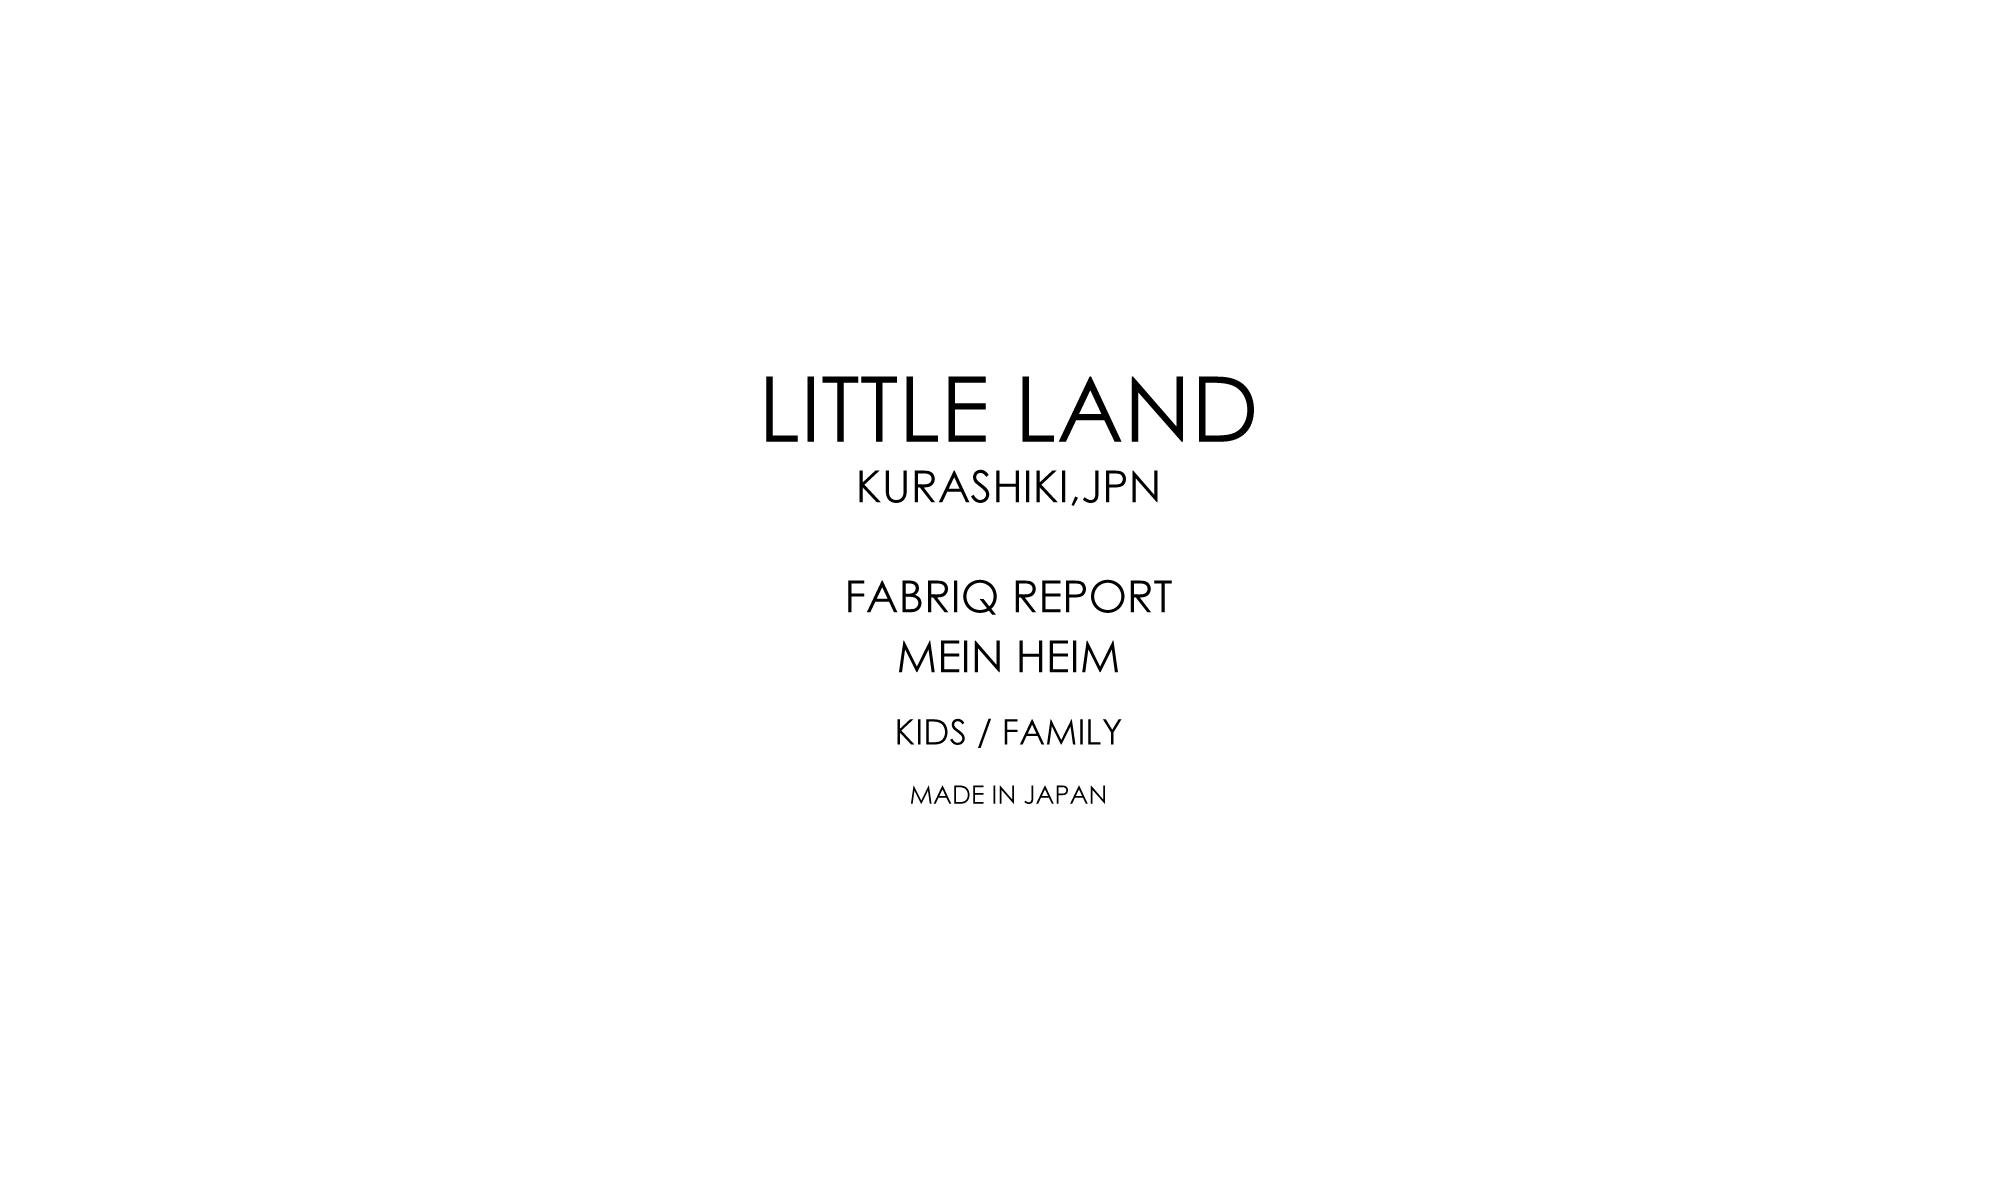 LITTLE LAND OFFICIAL